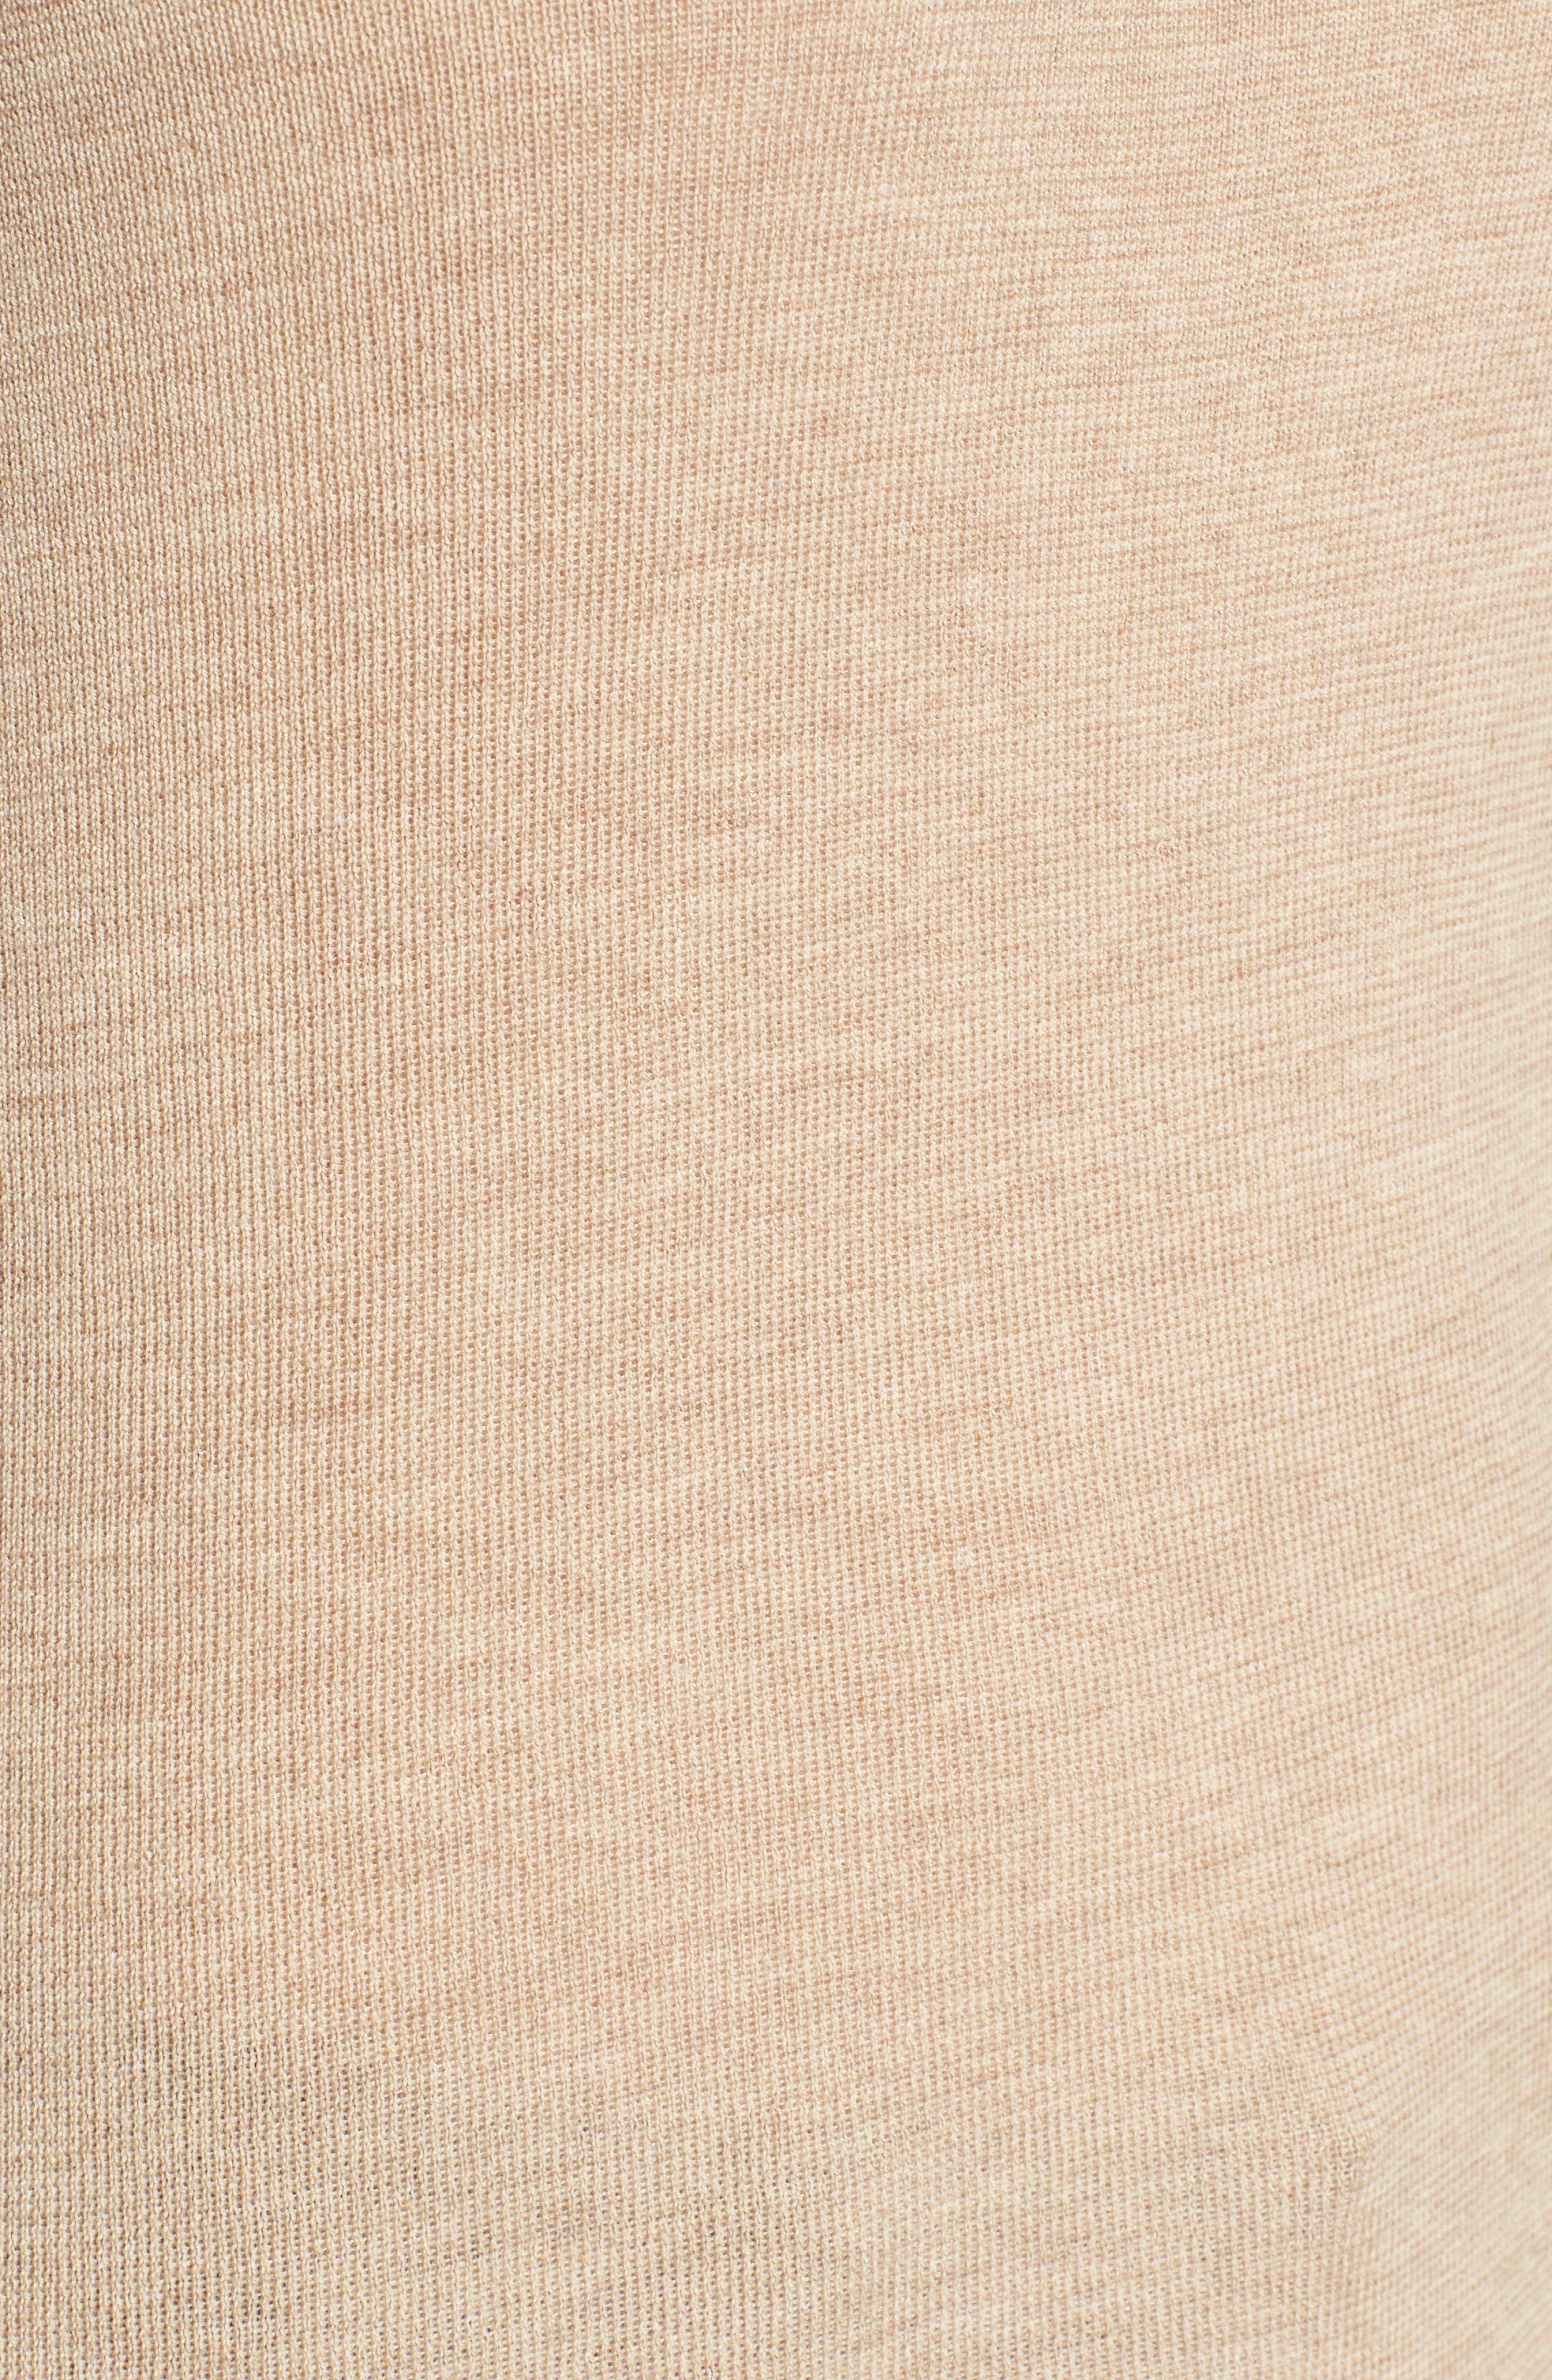 The Fisher Project Ultrafine Merino Turtleneck Sweater,                             Alternate thumbnail 5, color,                             Maple Oat